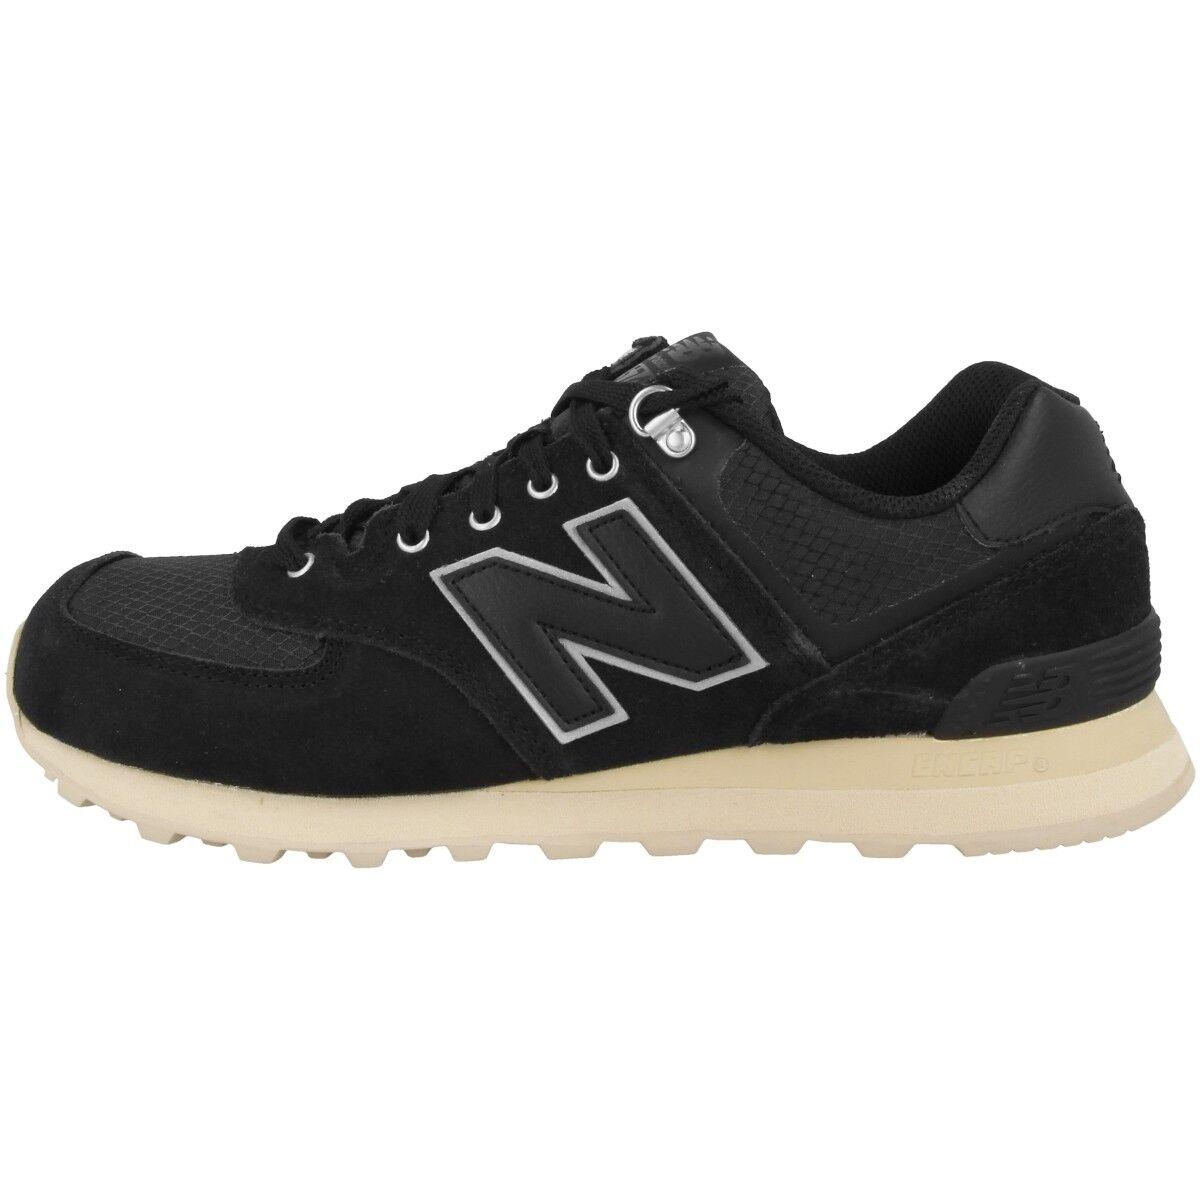 New New New balance ml 574 PKP zapatos negro Sand cortos ml574pkp 410 420 576 754 373 cdad78